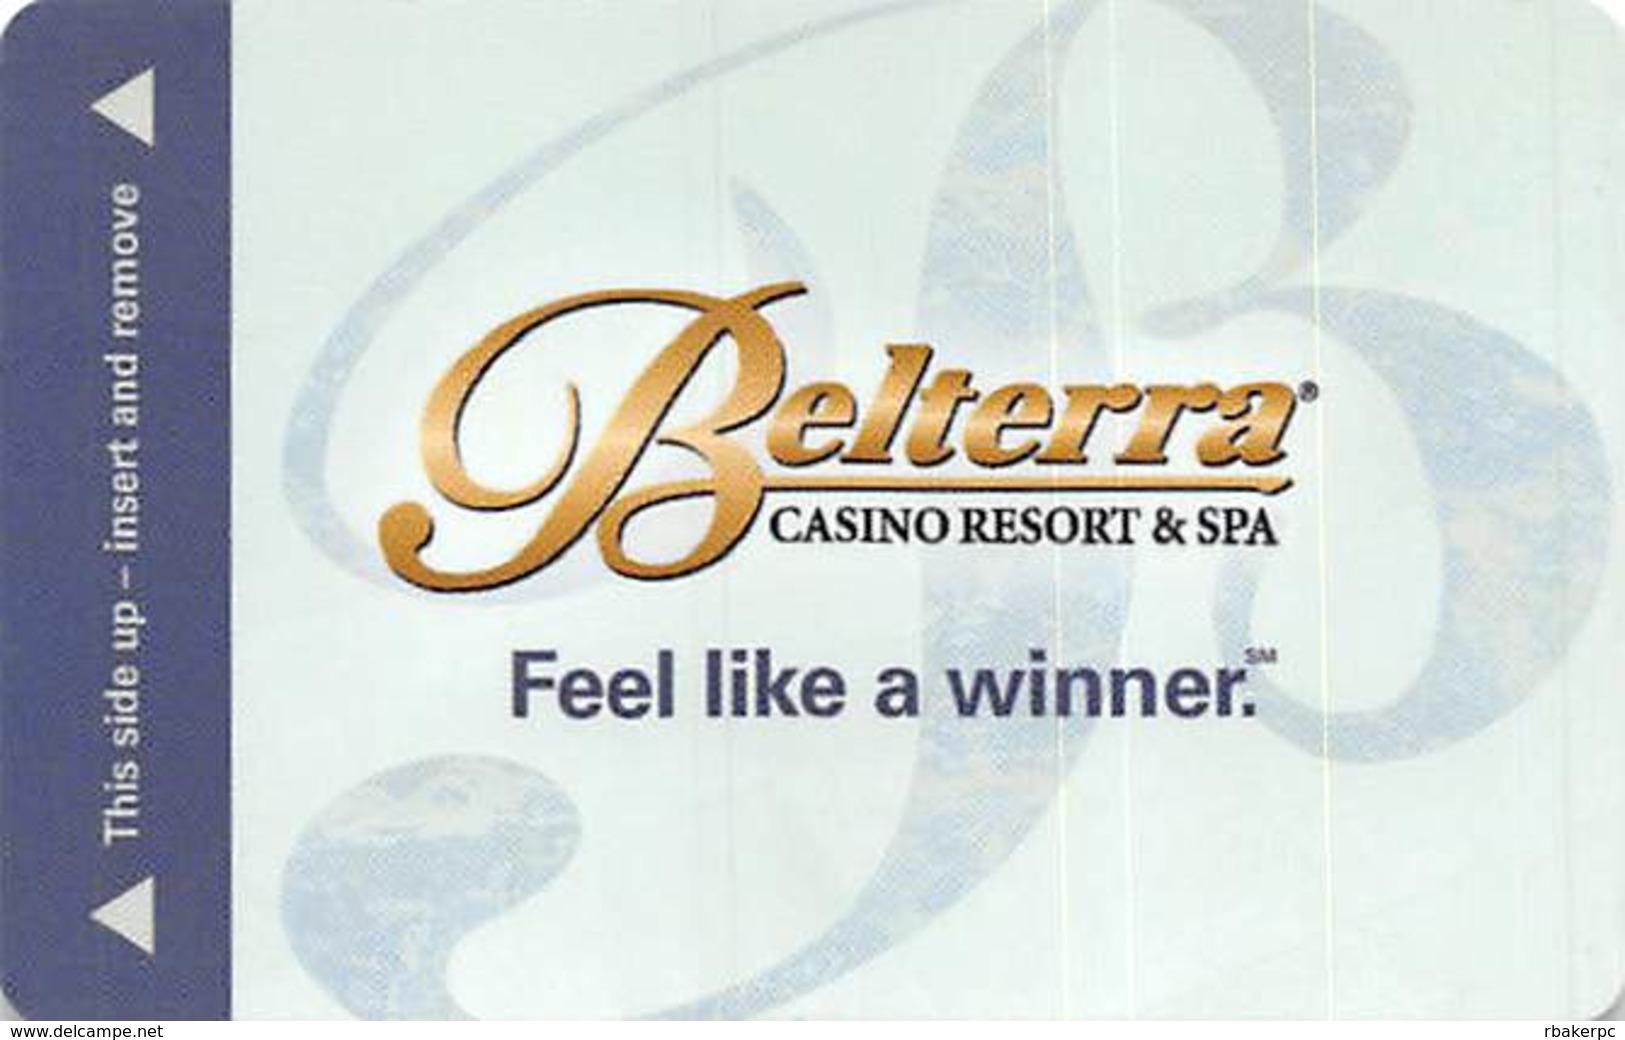 Belterra Casino Resort - Florence, IN - Hotel Room Key Card - Hotel Keycards